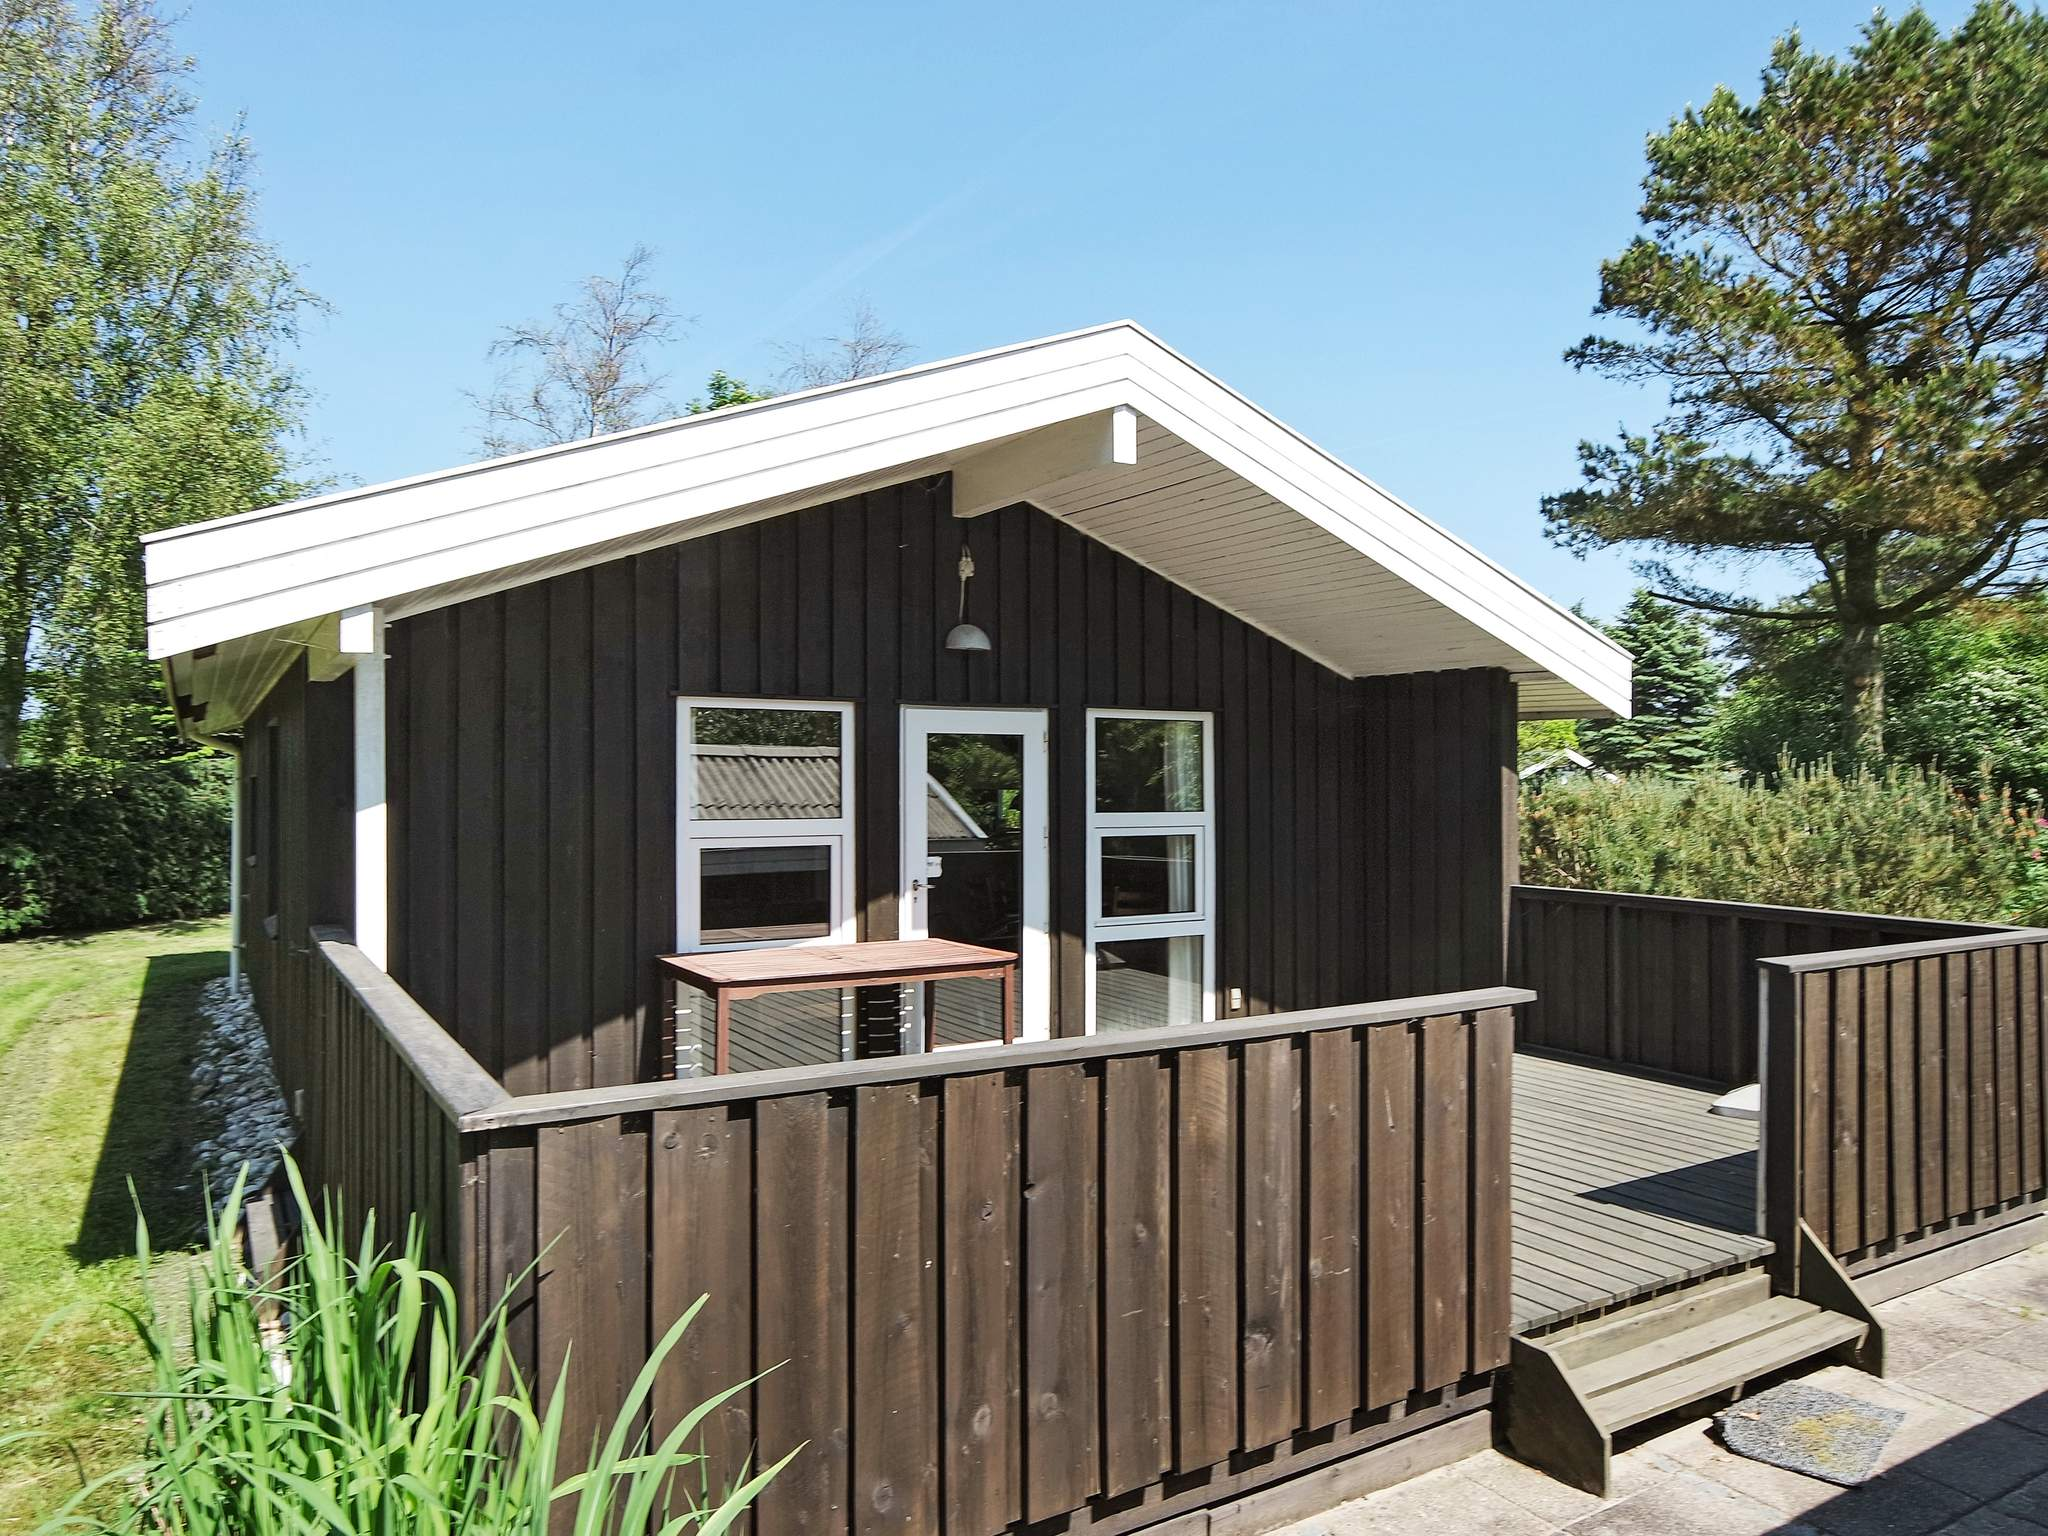 Ferienhaus Øster Hurup (81731), Øster Hurup, , Ostjütland, Dänemark, Bild 1